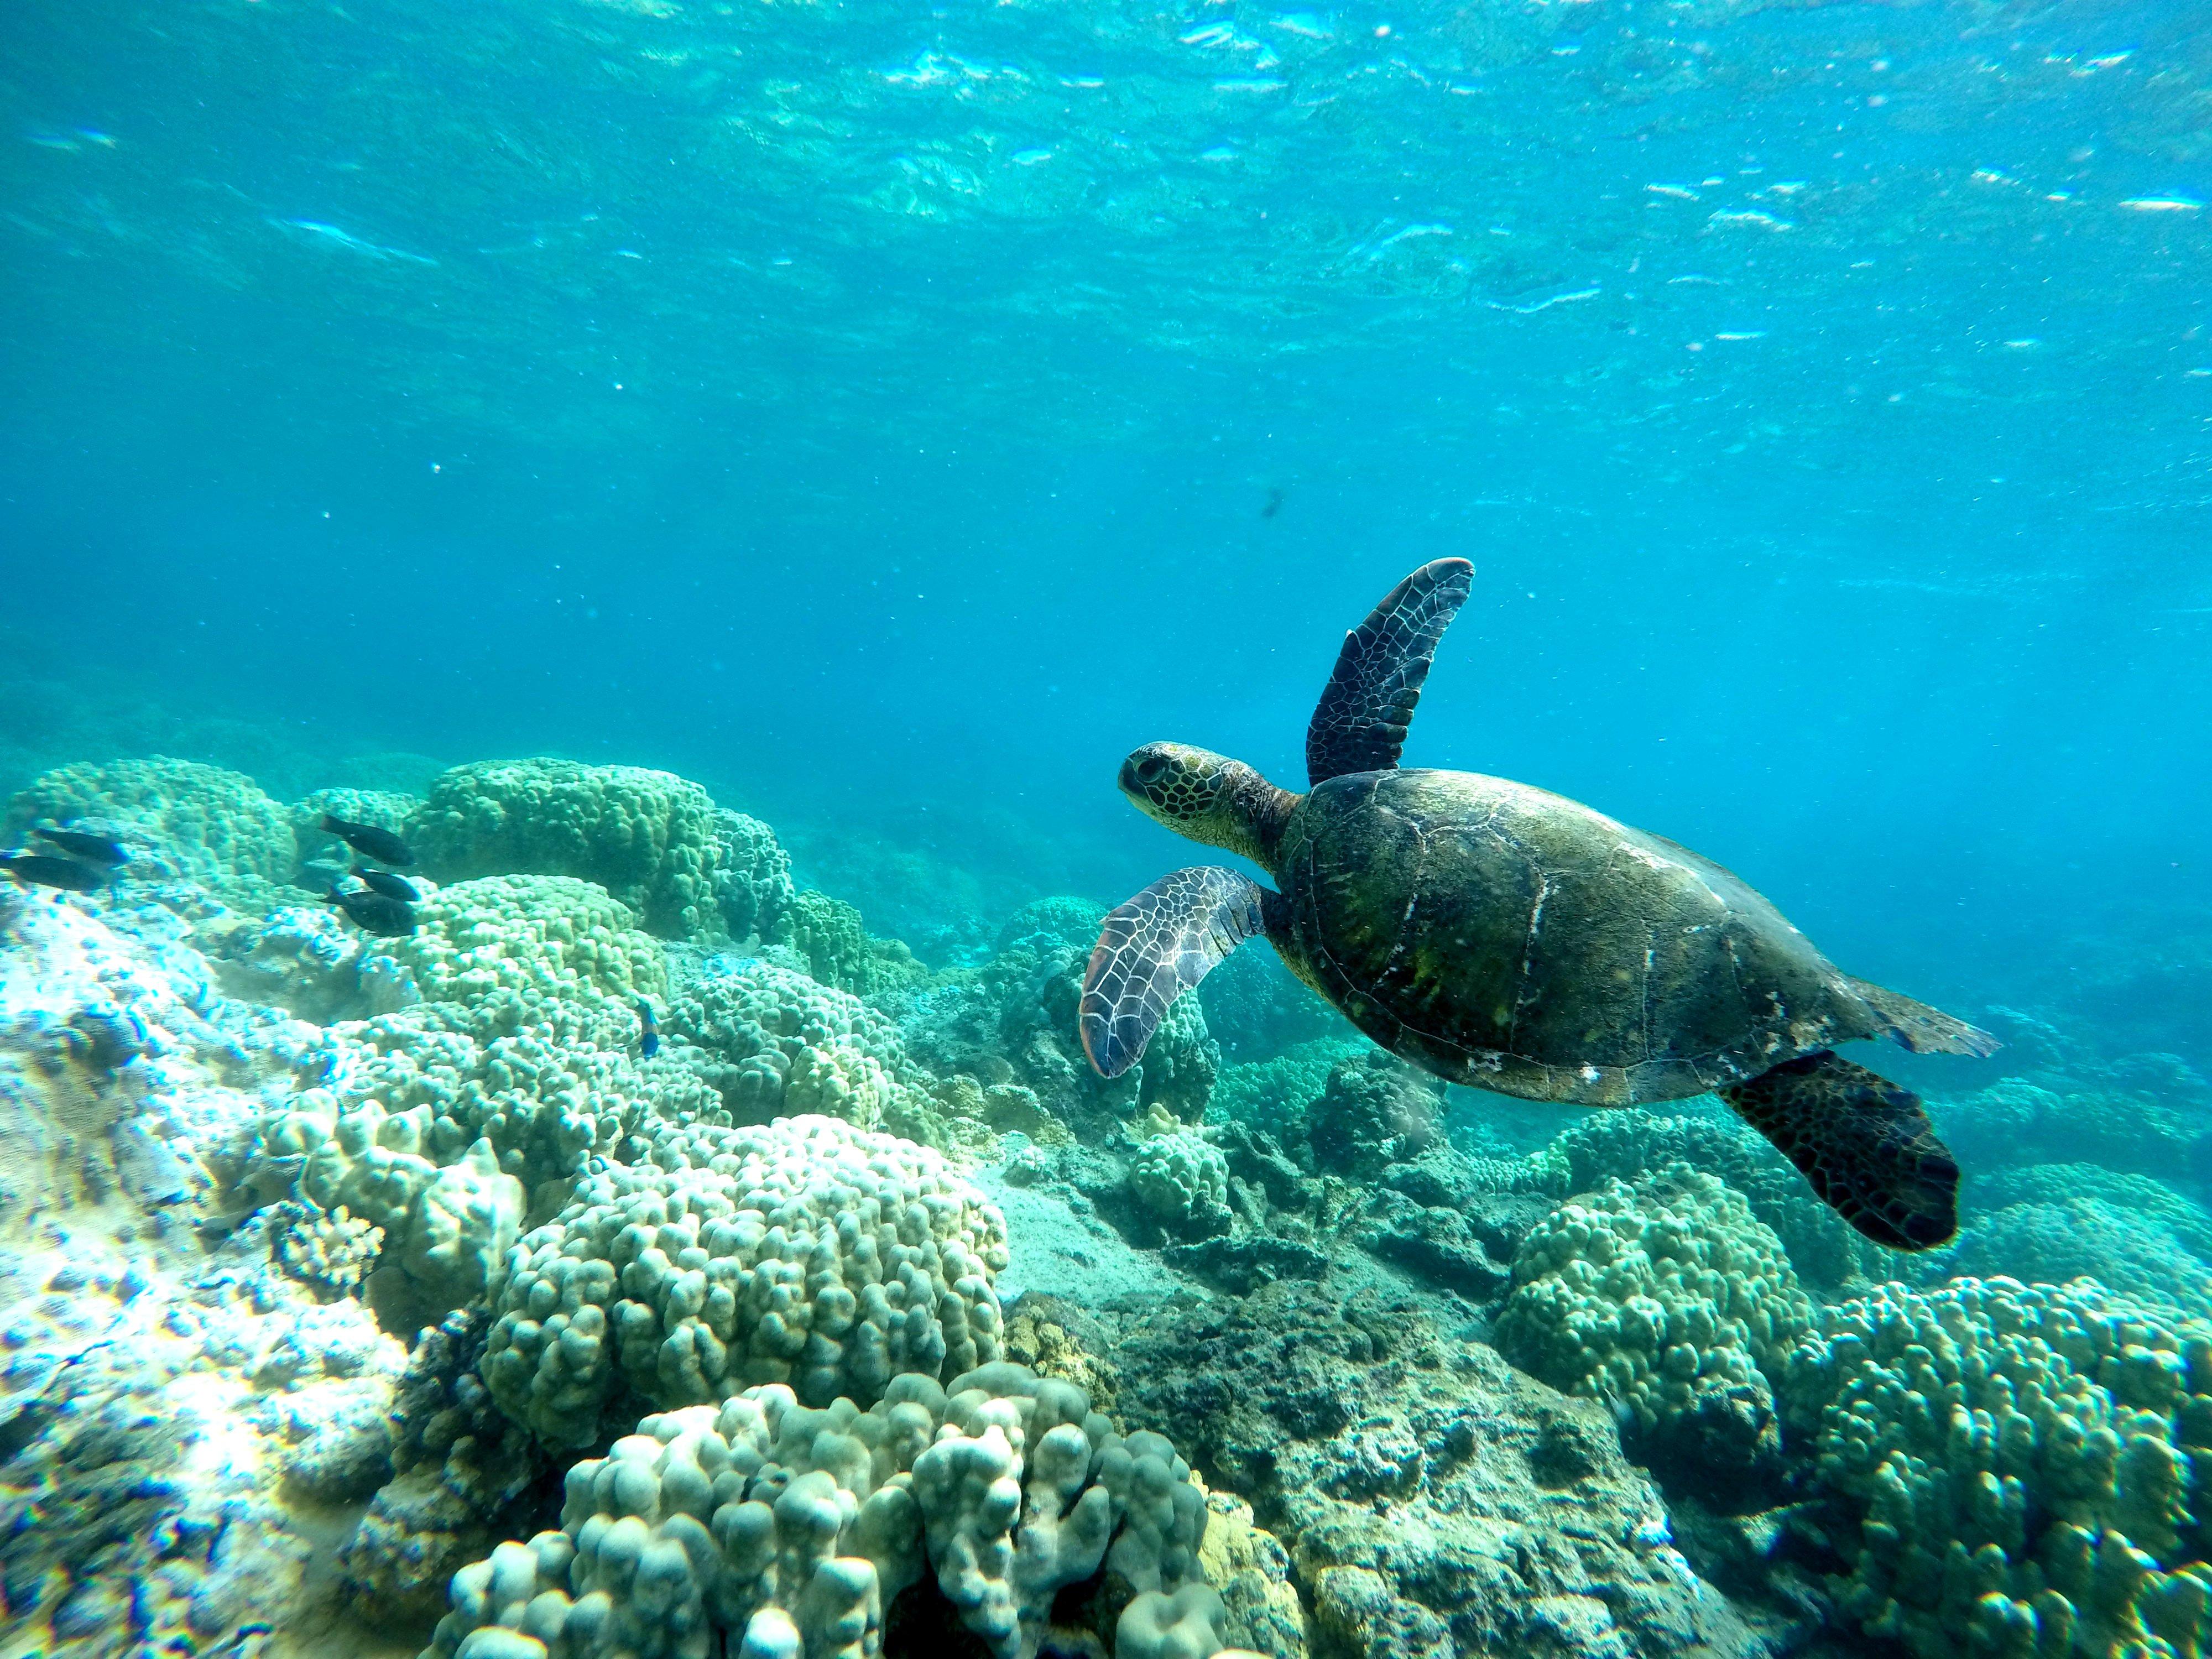 A Green Sea Turtle (Honu) cruises past a stationary camera deployed at the tidepools at Waiopae, Hawaii Island.